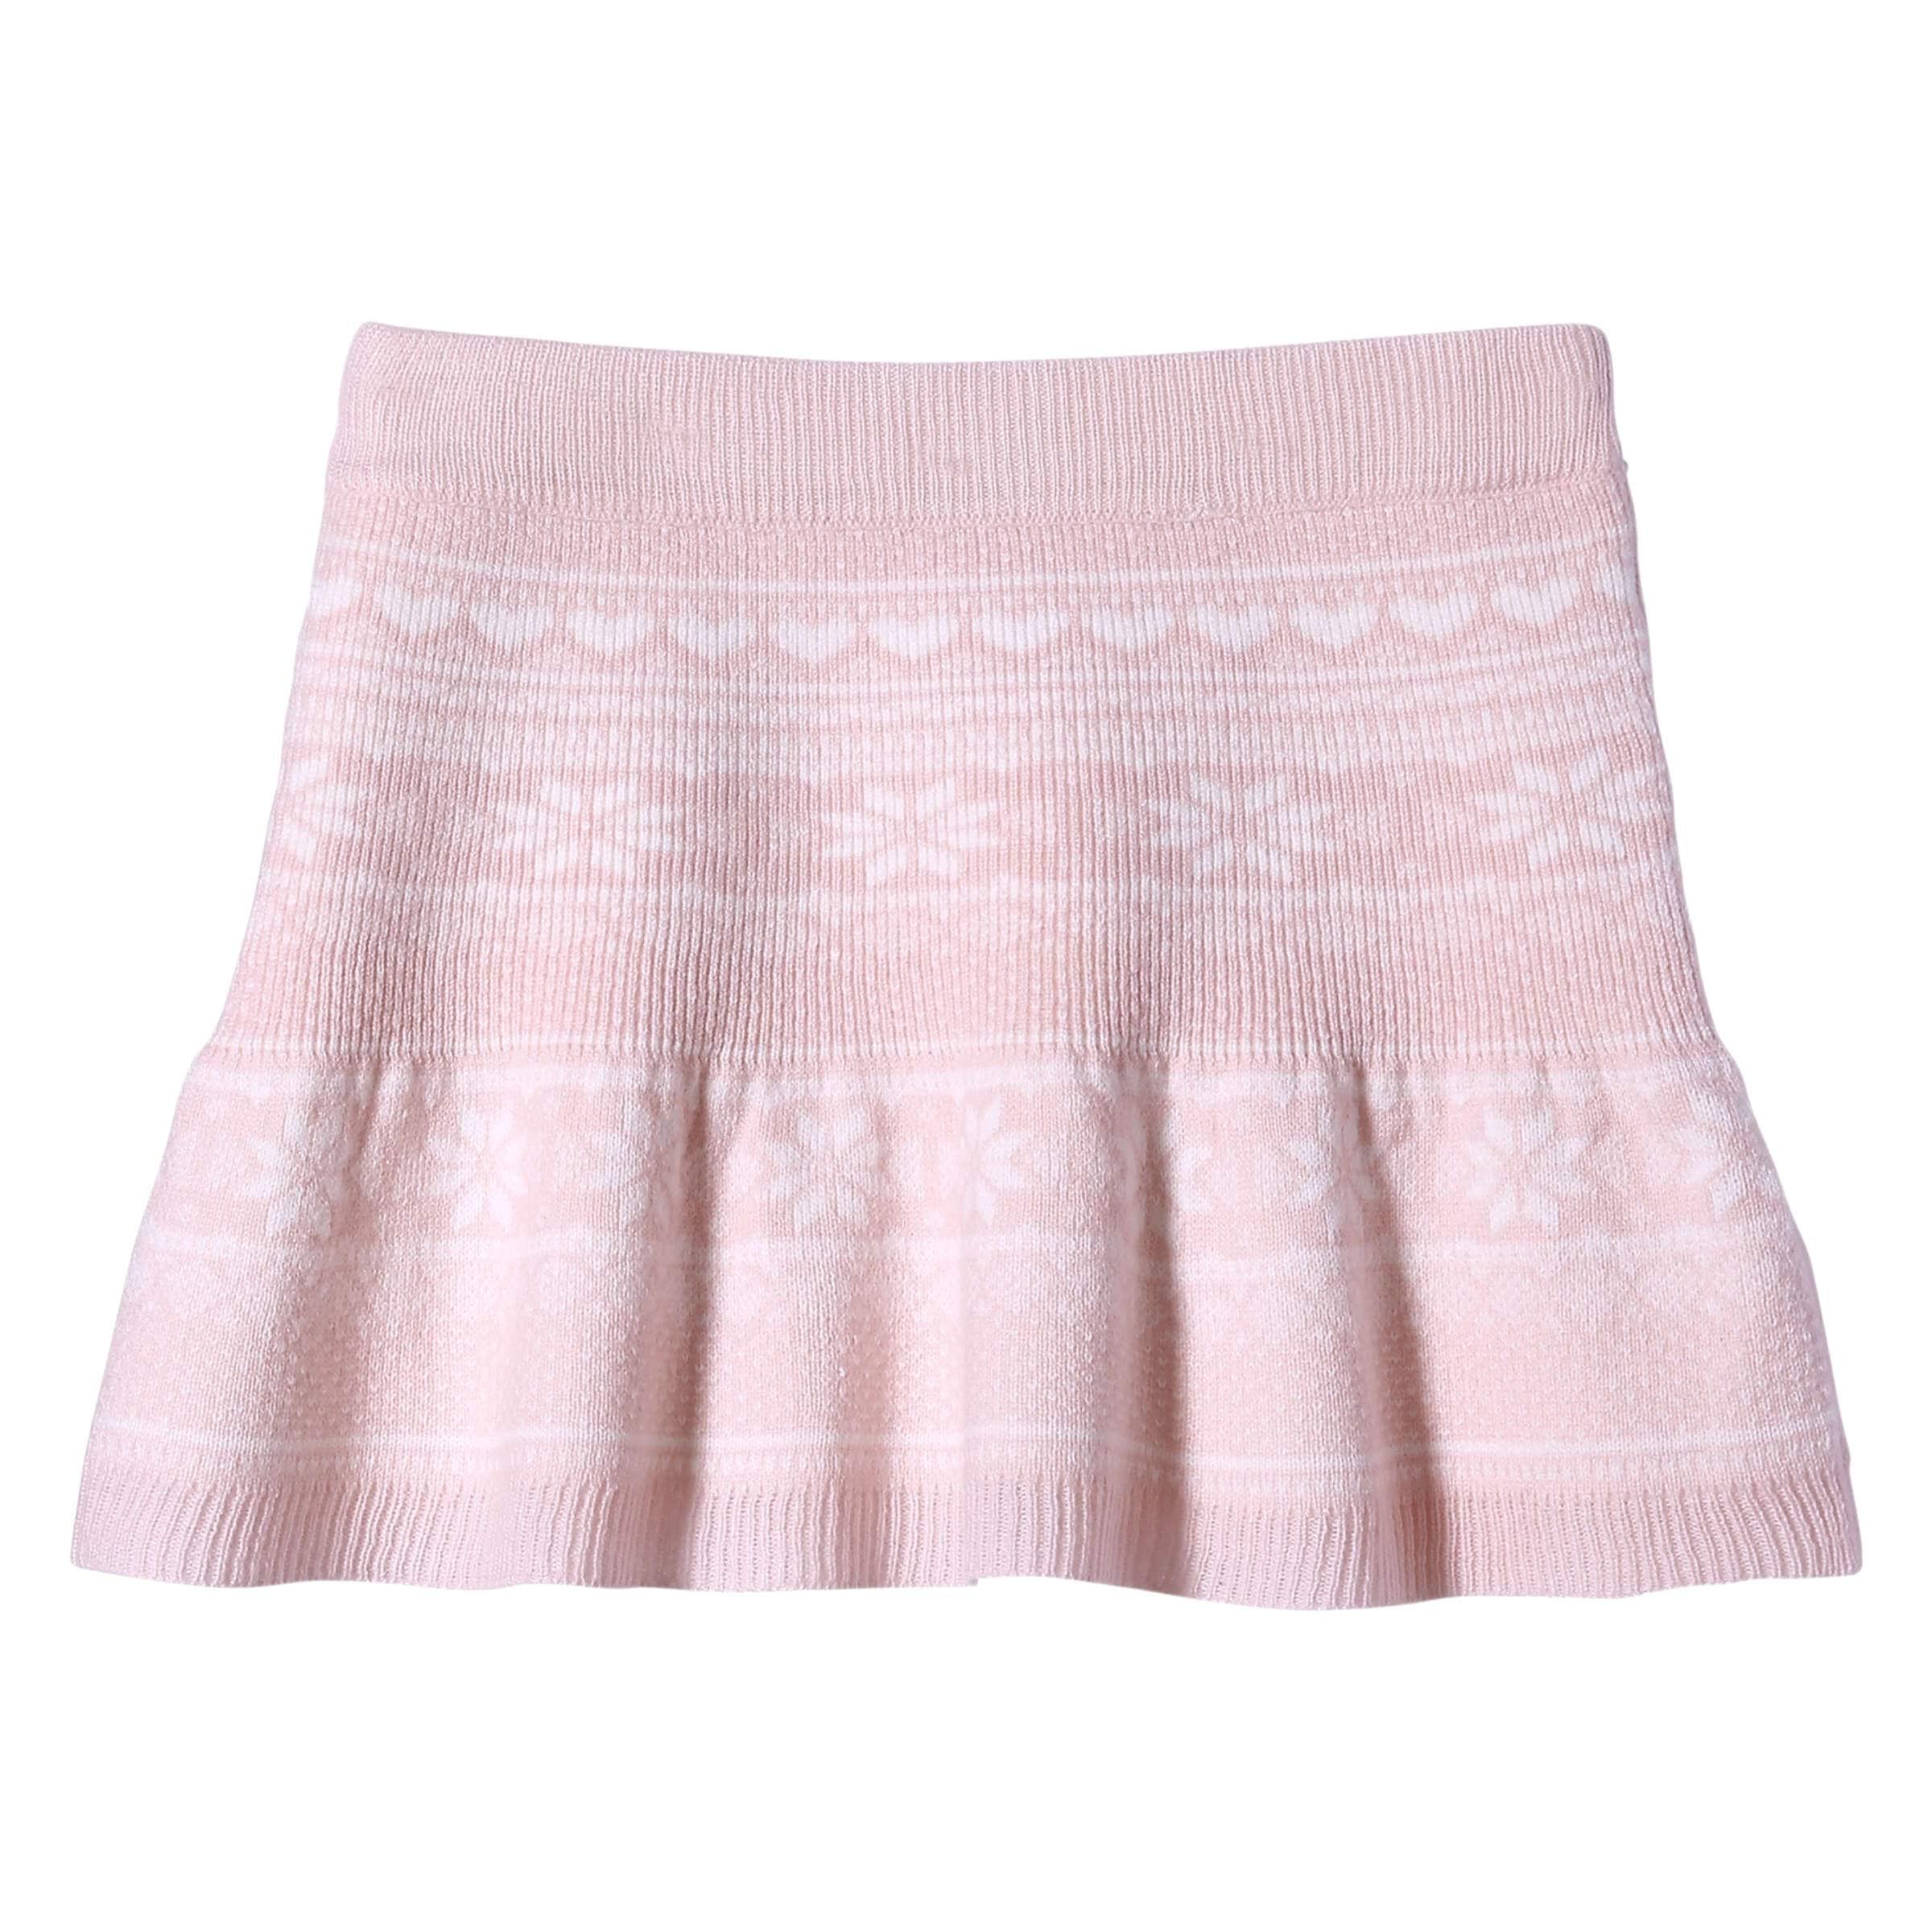 Joe Fresh Toddler Girls' Fair Isle Flared Skirt